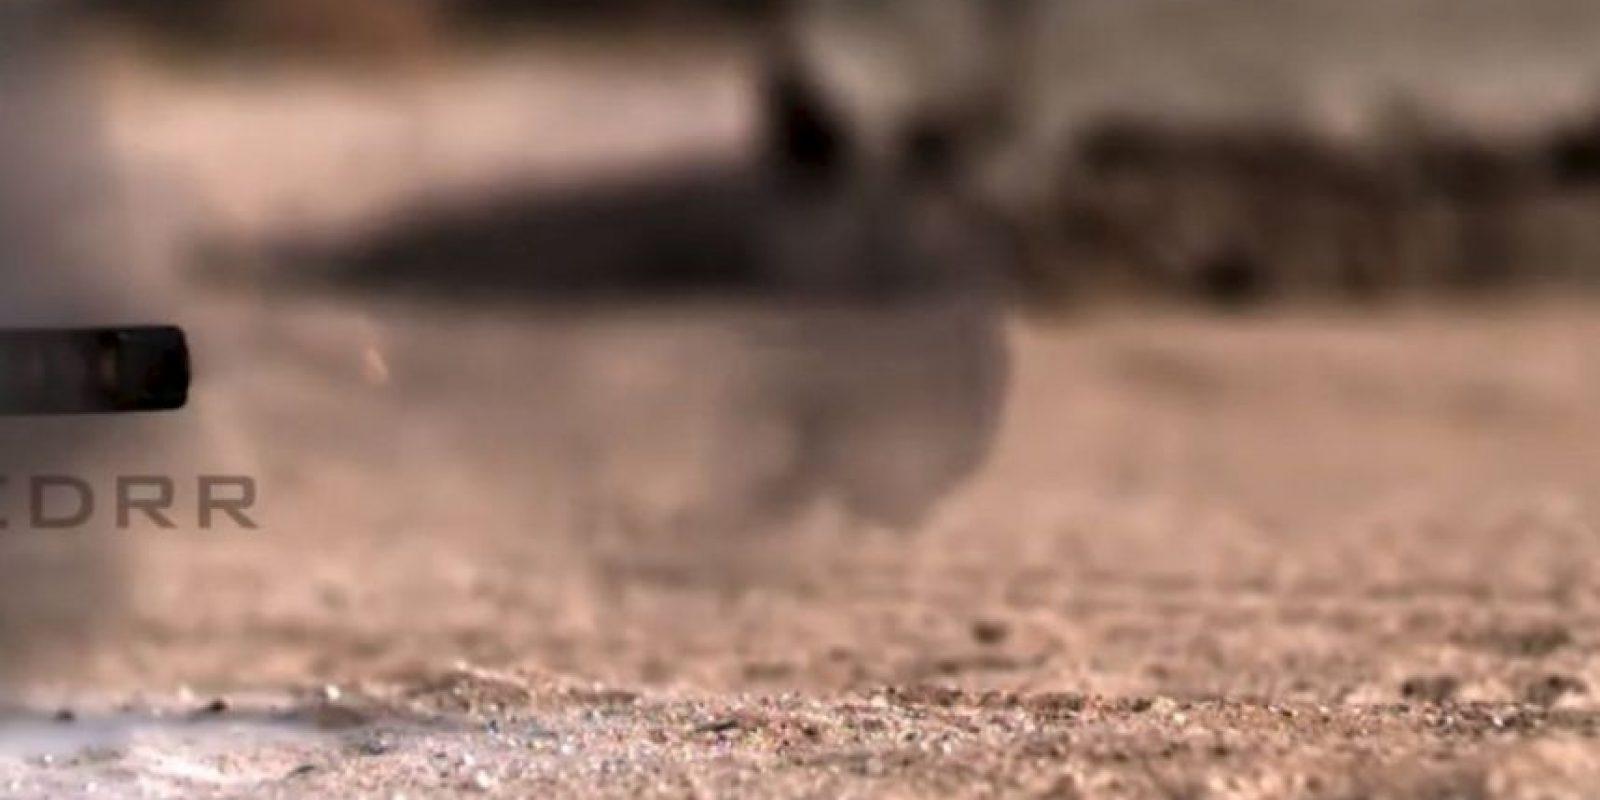 Una bala calibre 50 también se enfrentó al iPhone. Foto:FullMag